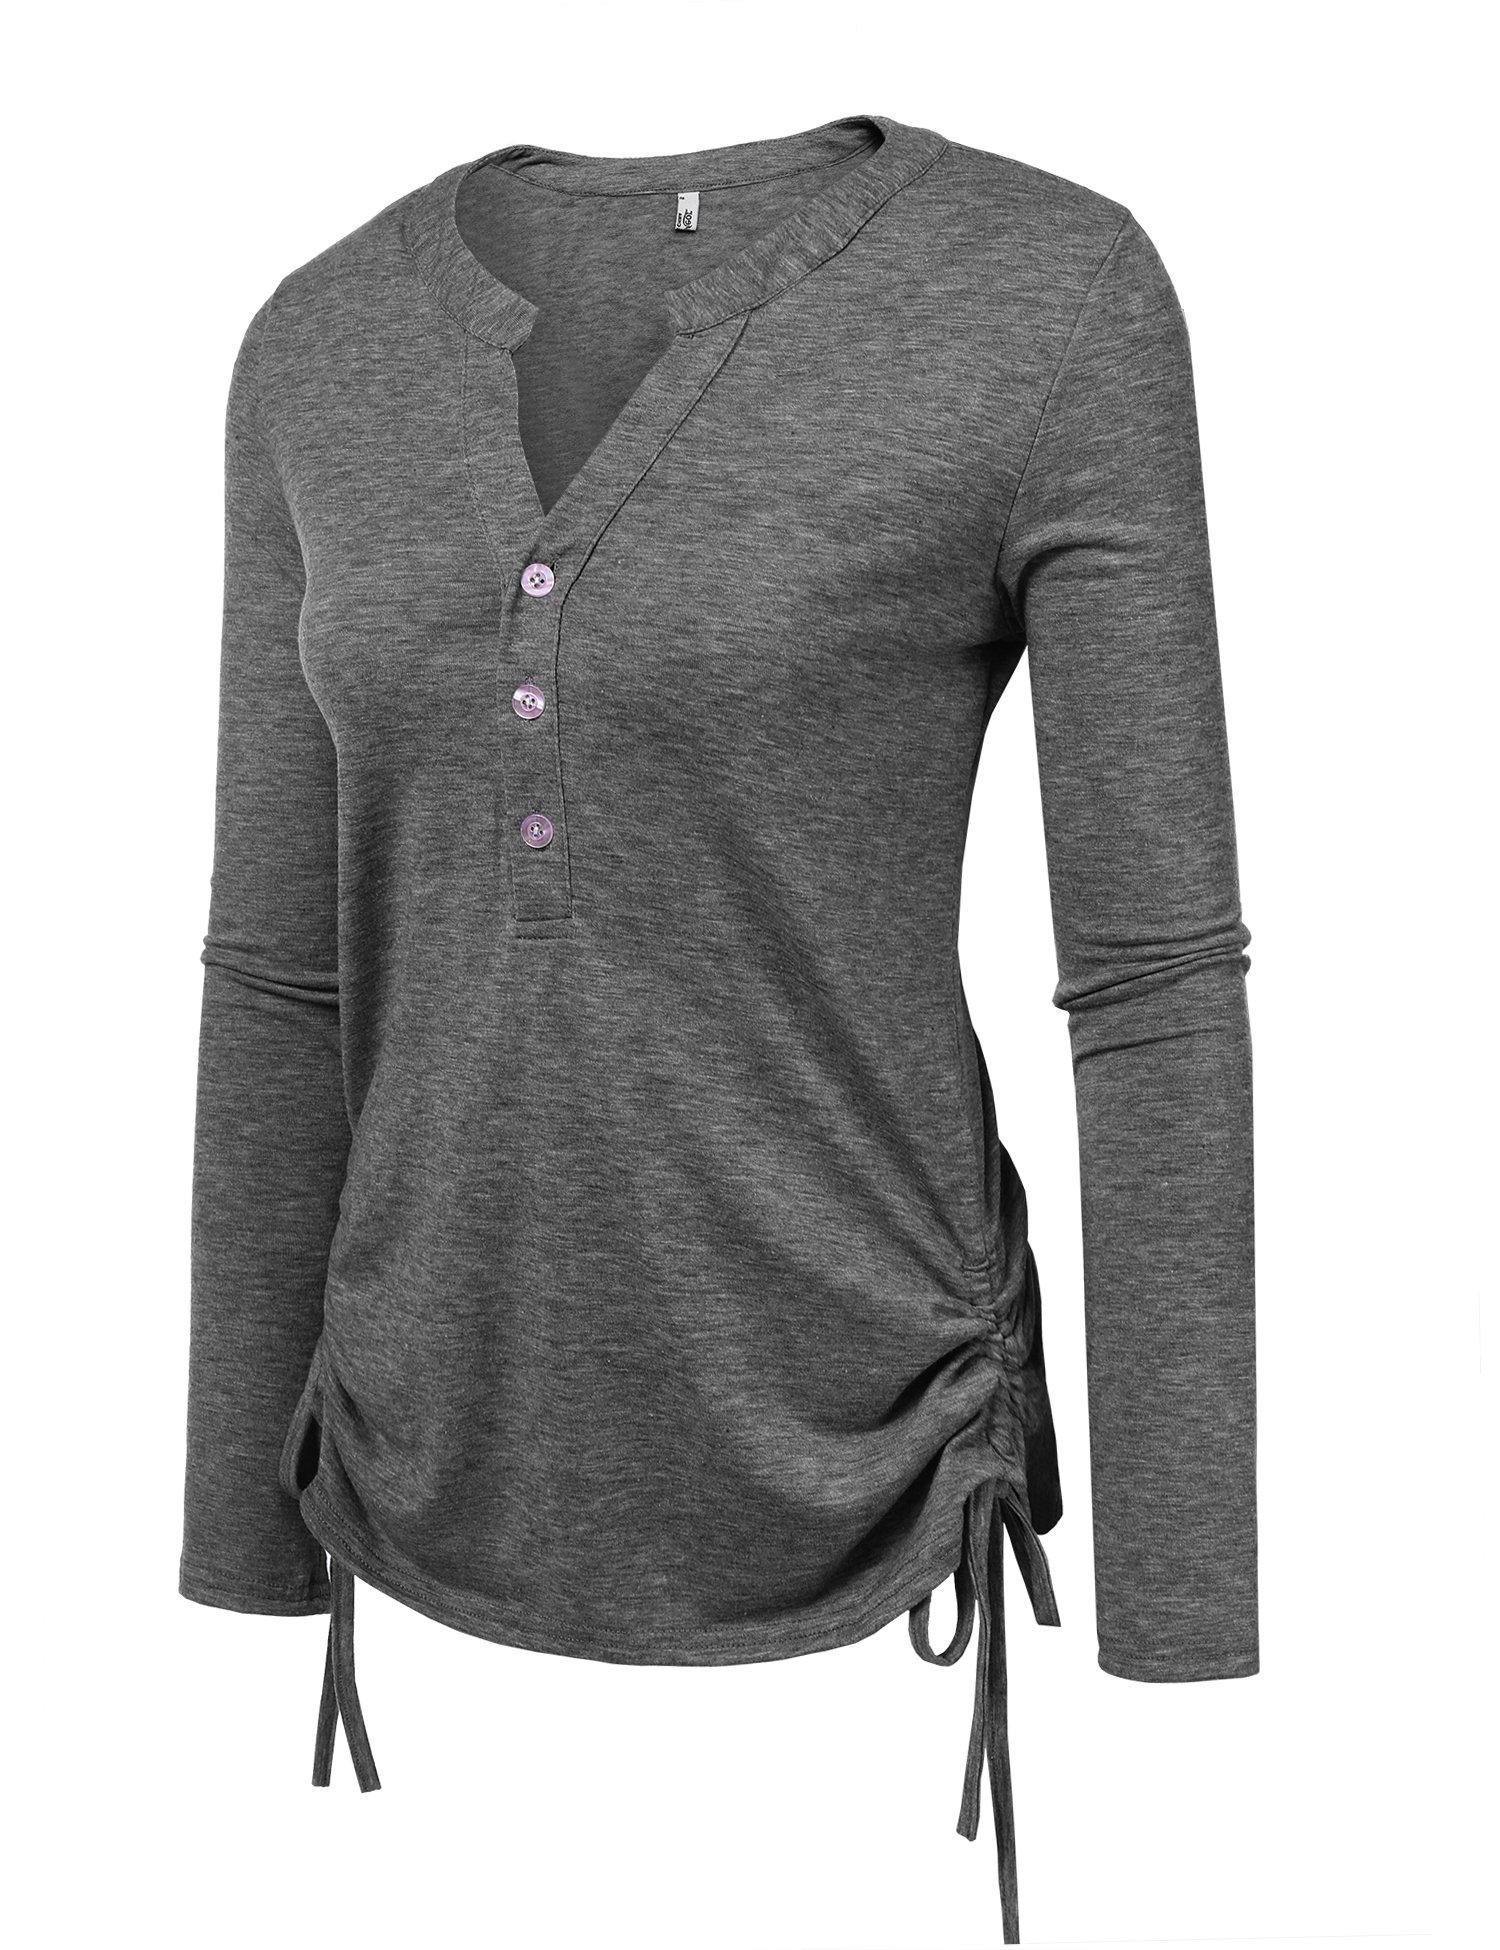 Zeagoo Womens Long Sleeve Thermal Cotton Henley Casual T-Shirt,Small,(A)dark Grey